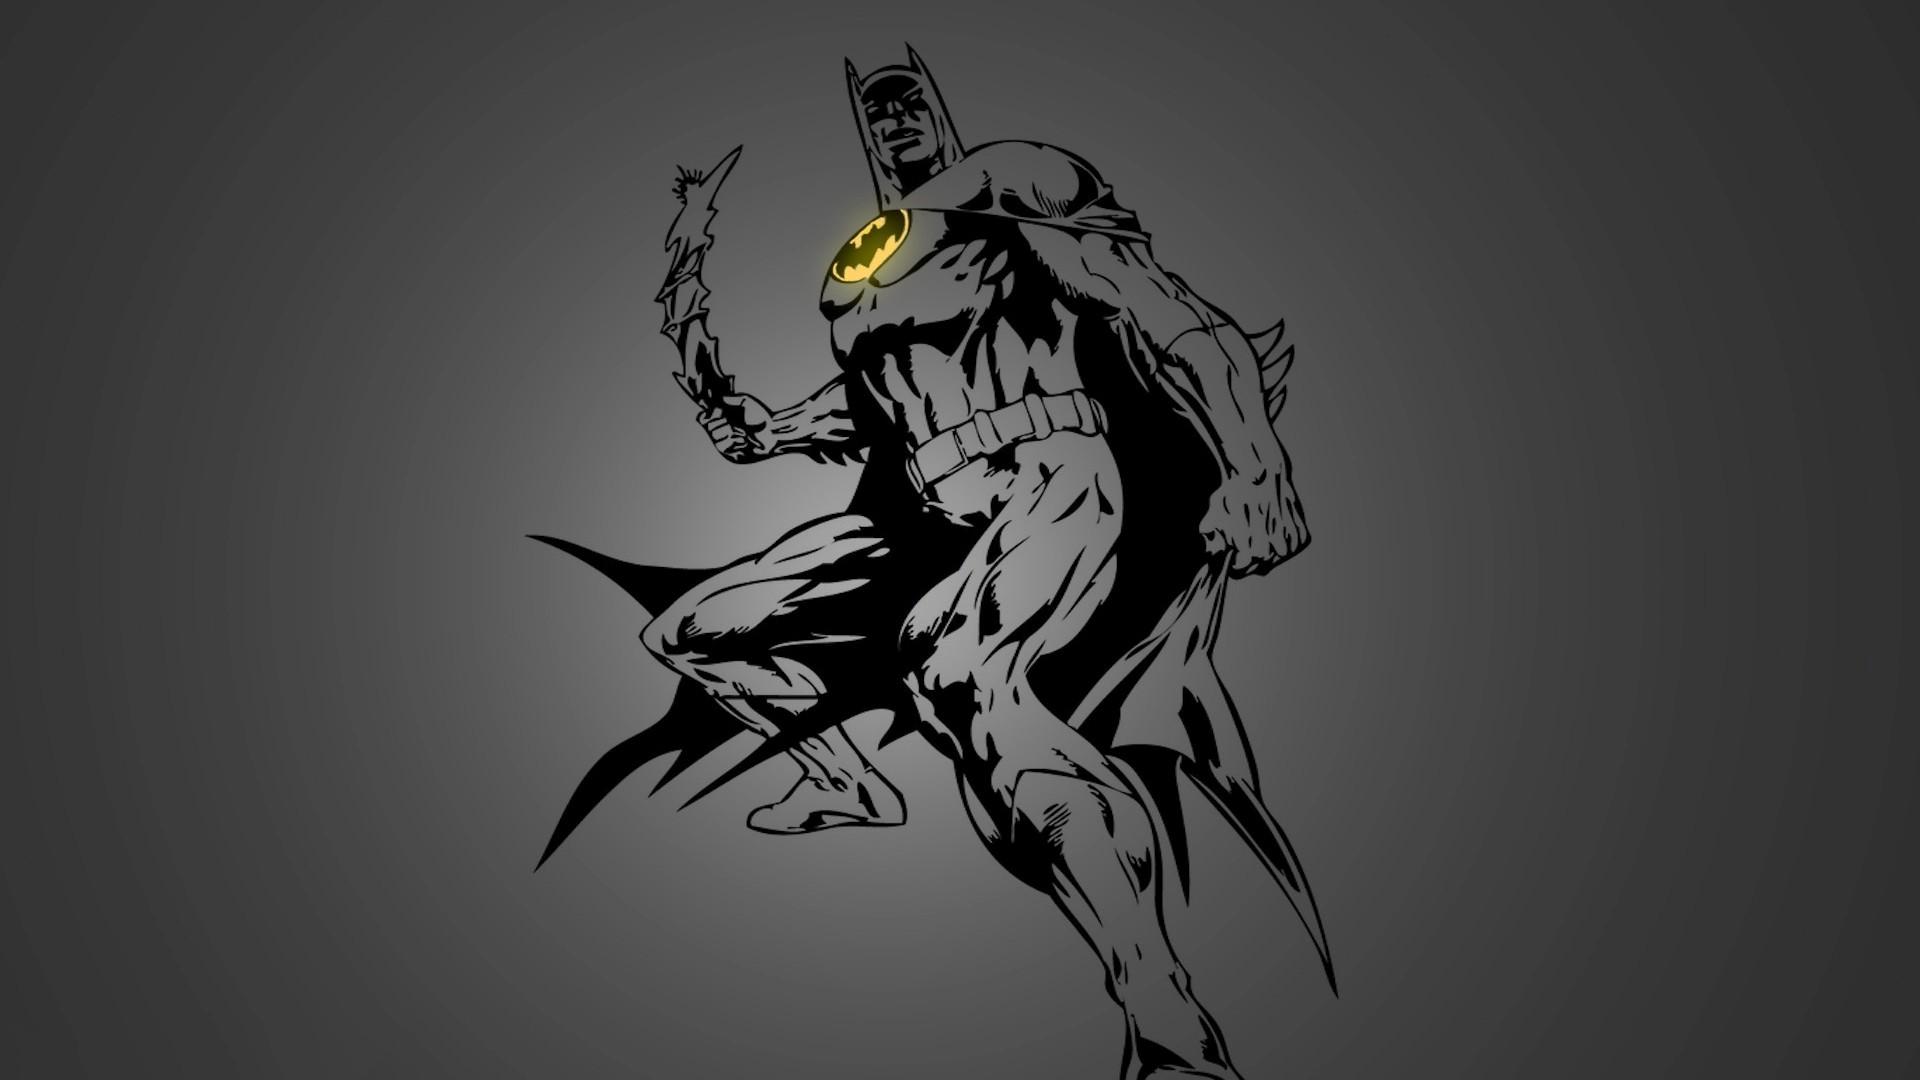 Download Batman Hd Wallpapers